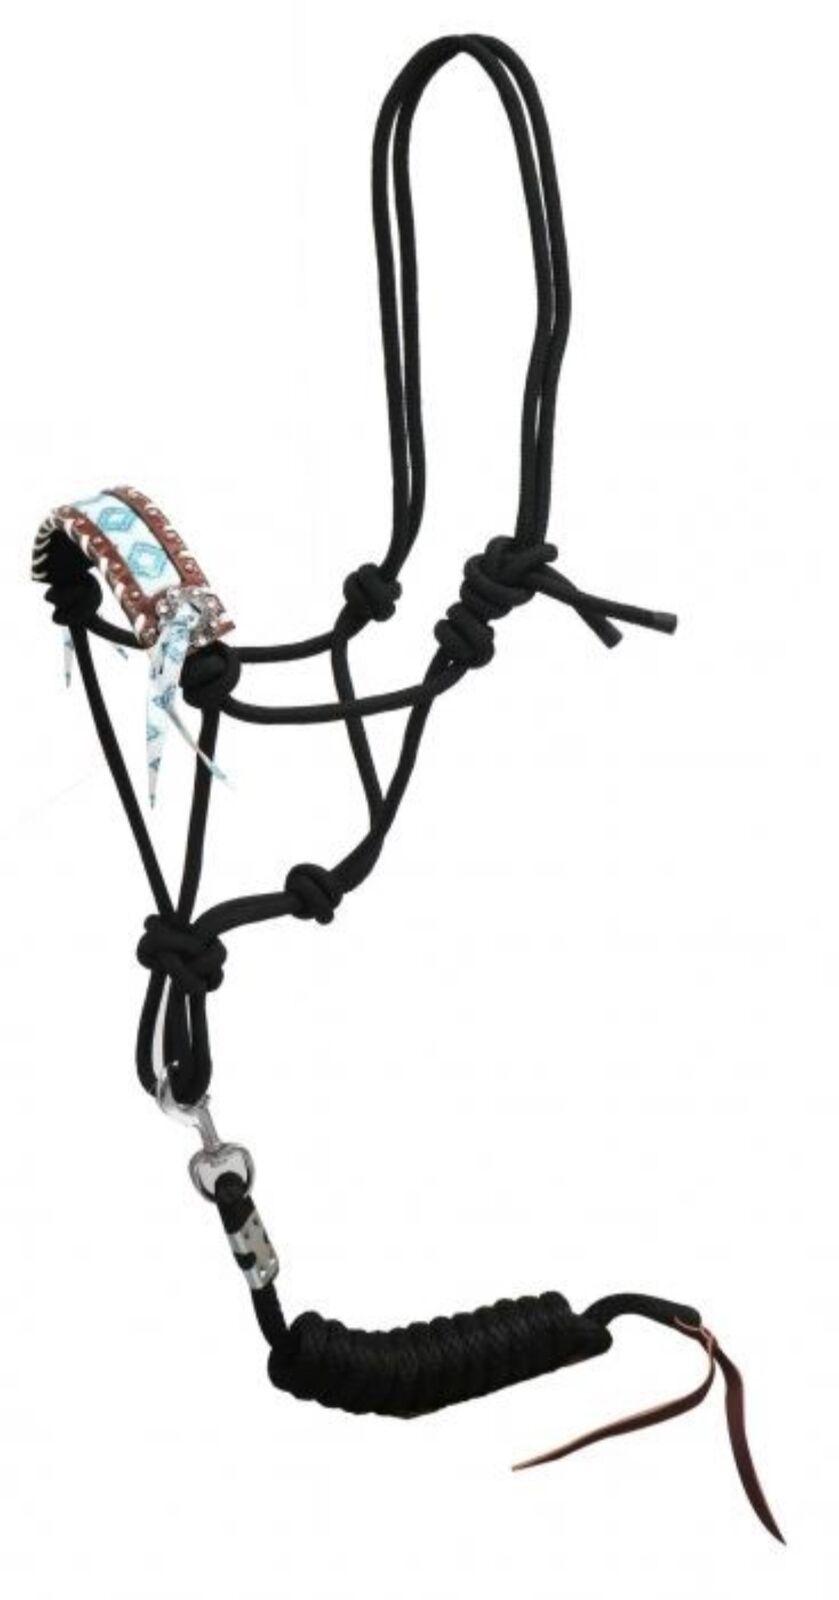 NEW HORSE TACK! Showman Leather Nose Roper Halter W// BROWN /& TEAL Navajo Design